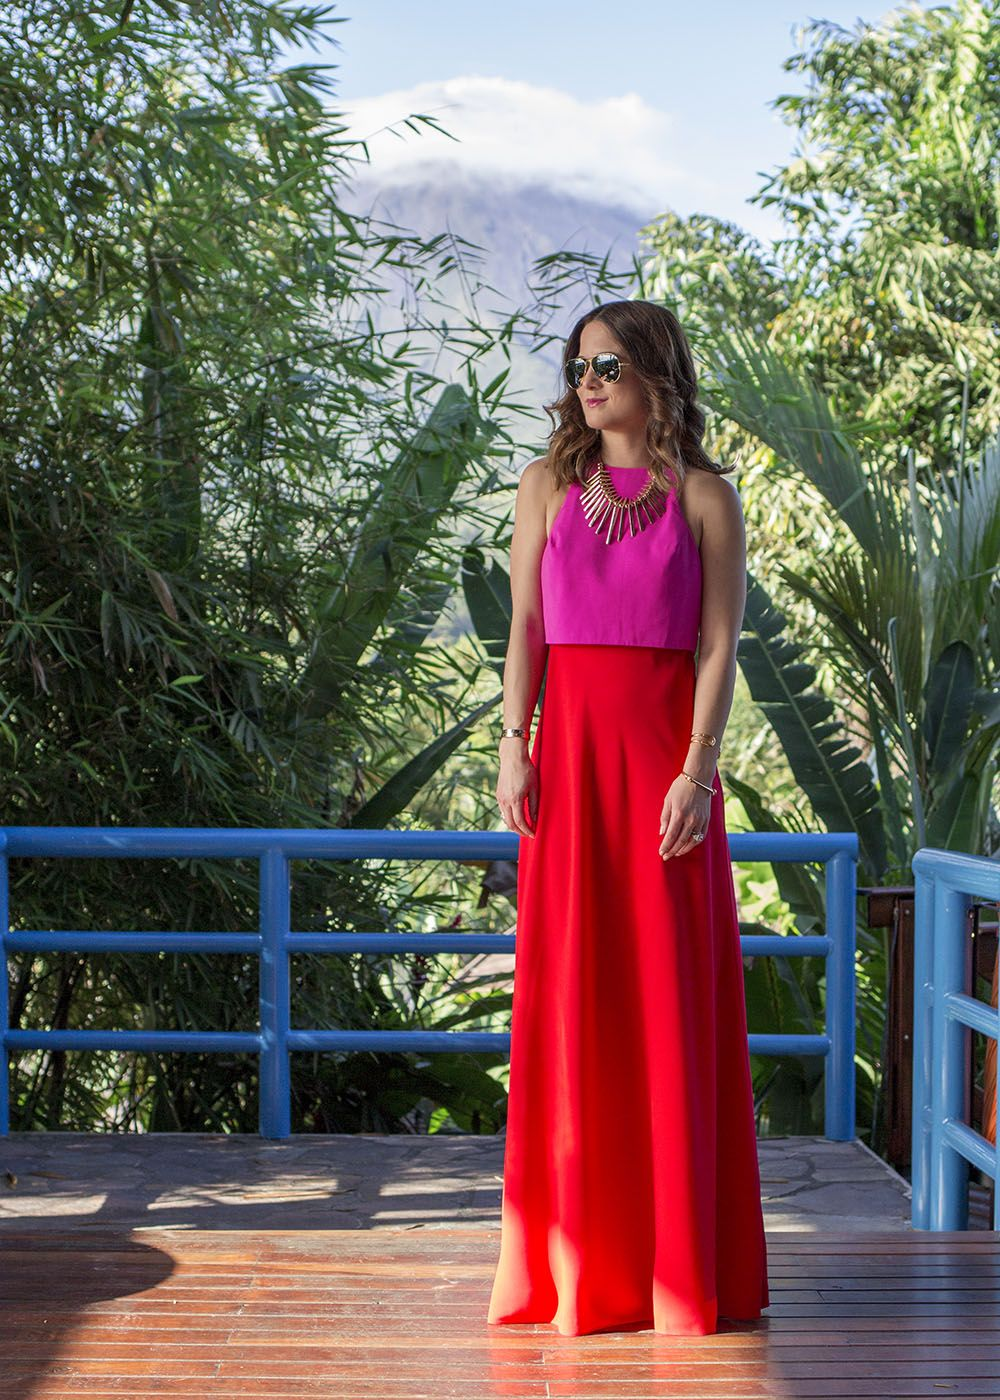 04.03.2015 // arenal nayara costa rica   pink dresses, chicago